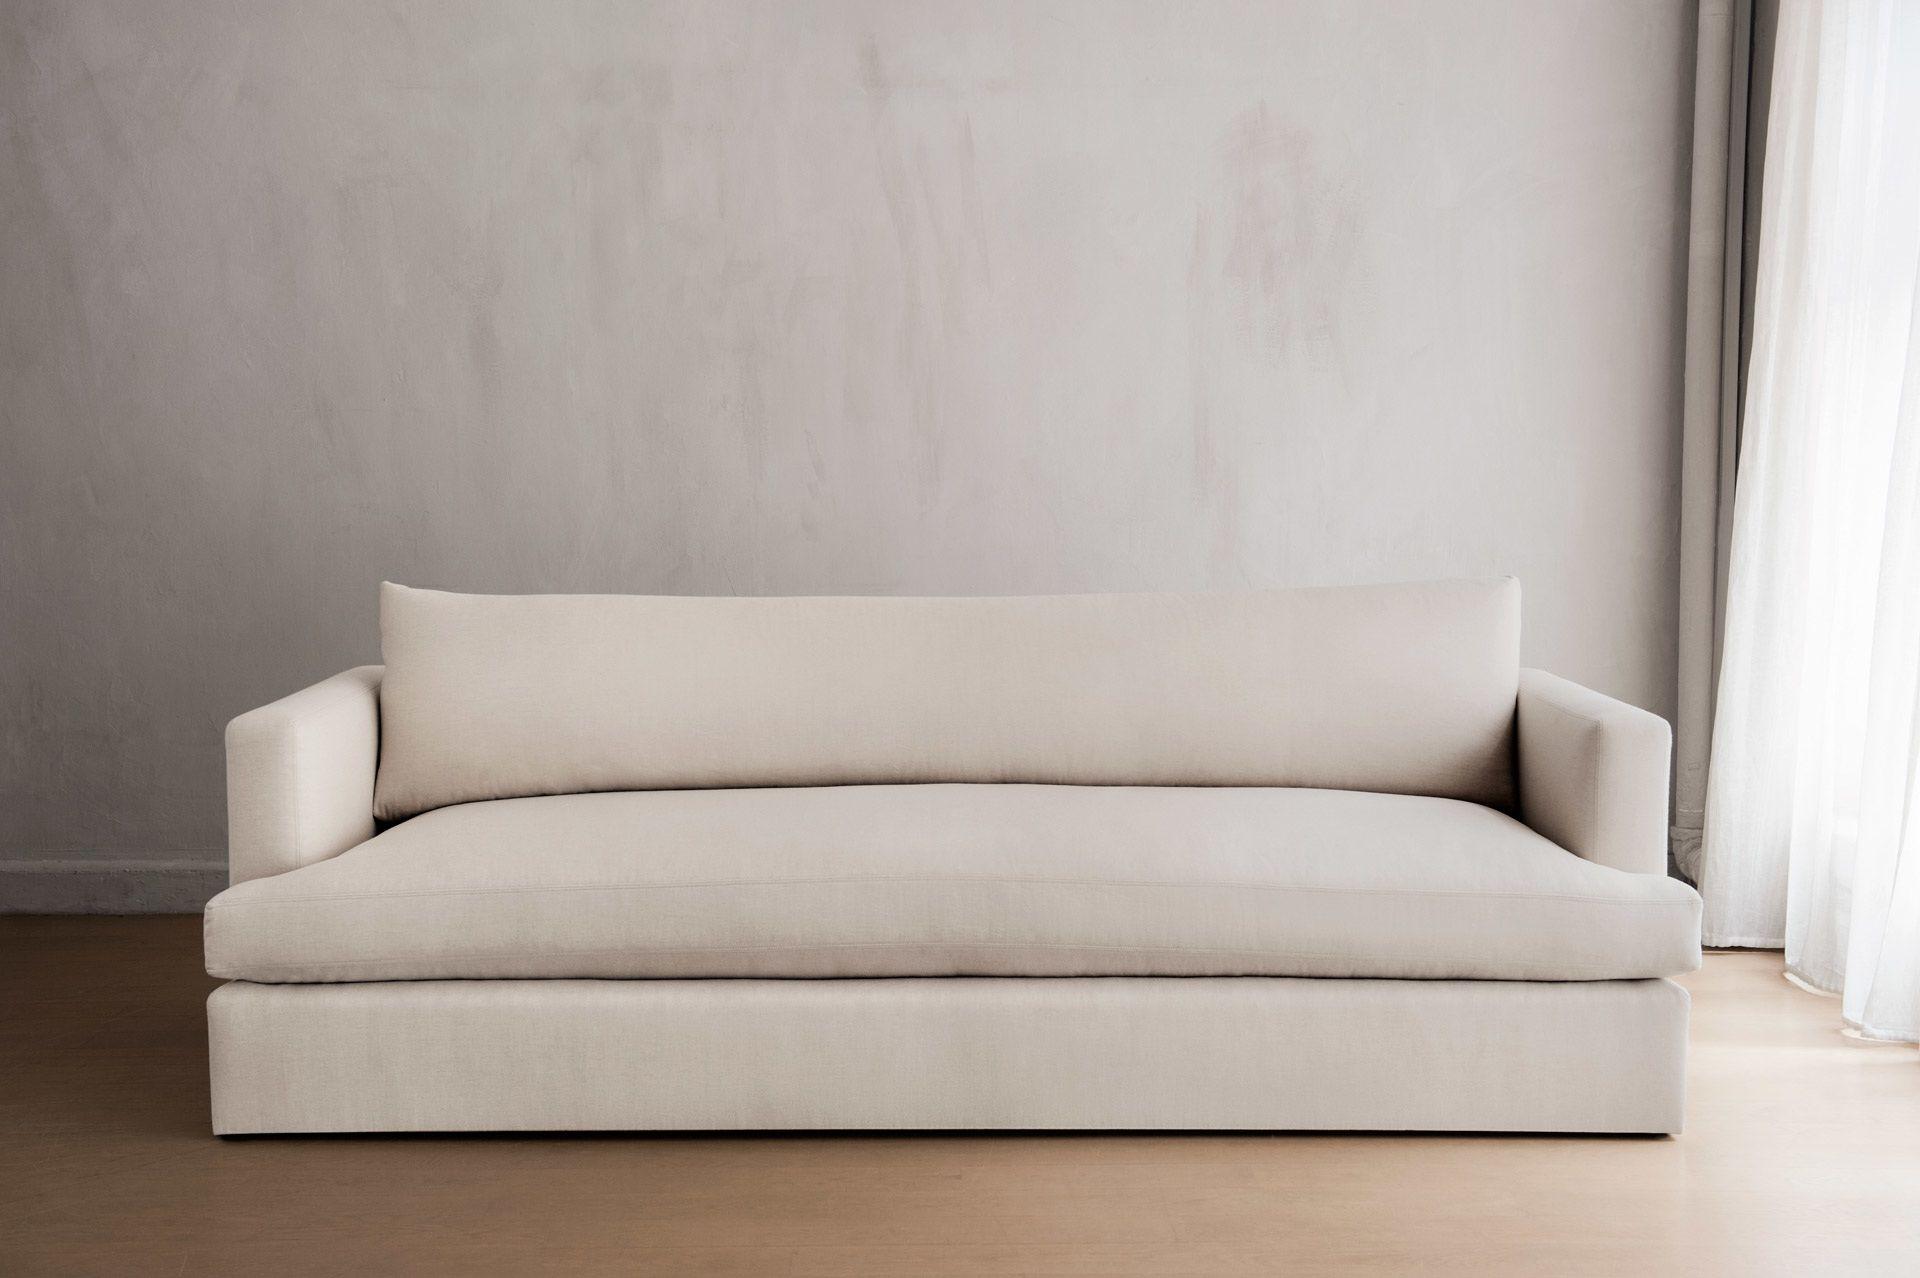 Chelsea Square Sofa Decorating Brown Leather Sofas Mono Dmitriy Co Architecture And Interior